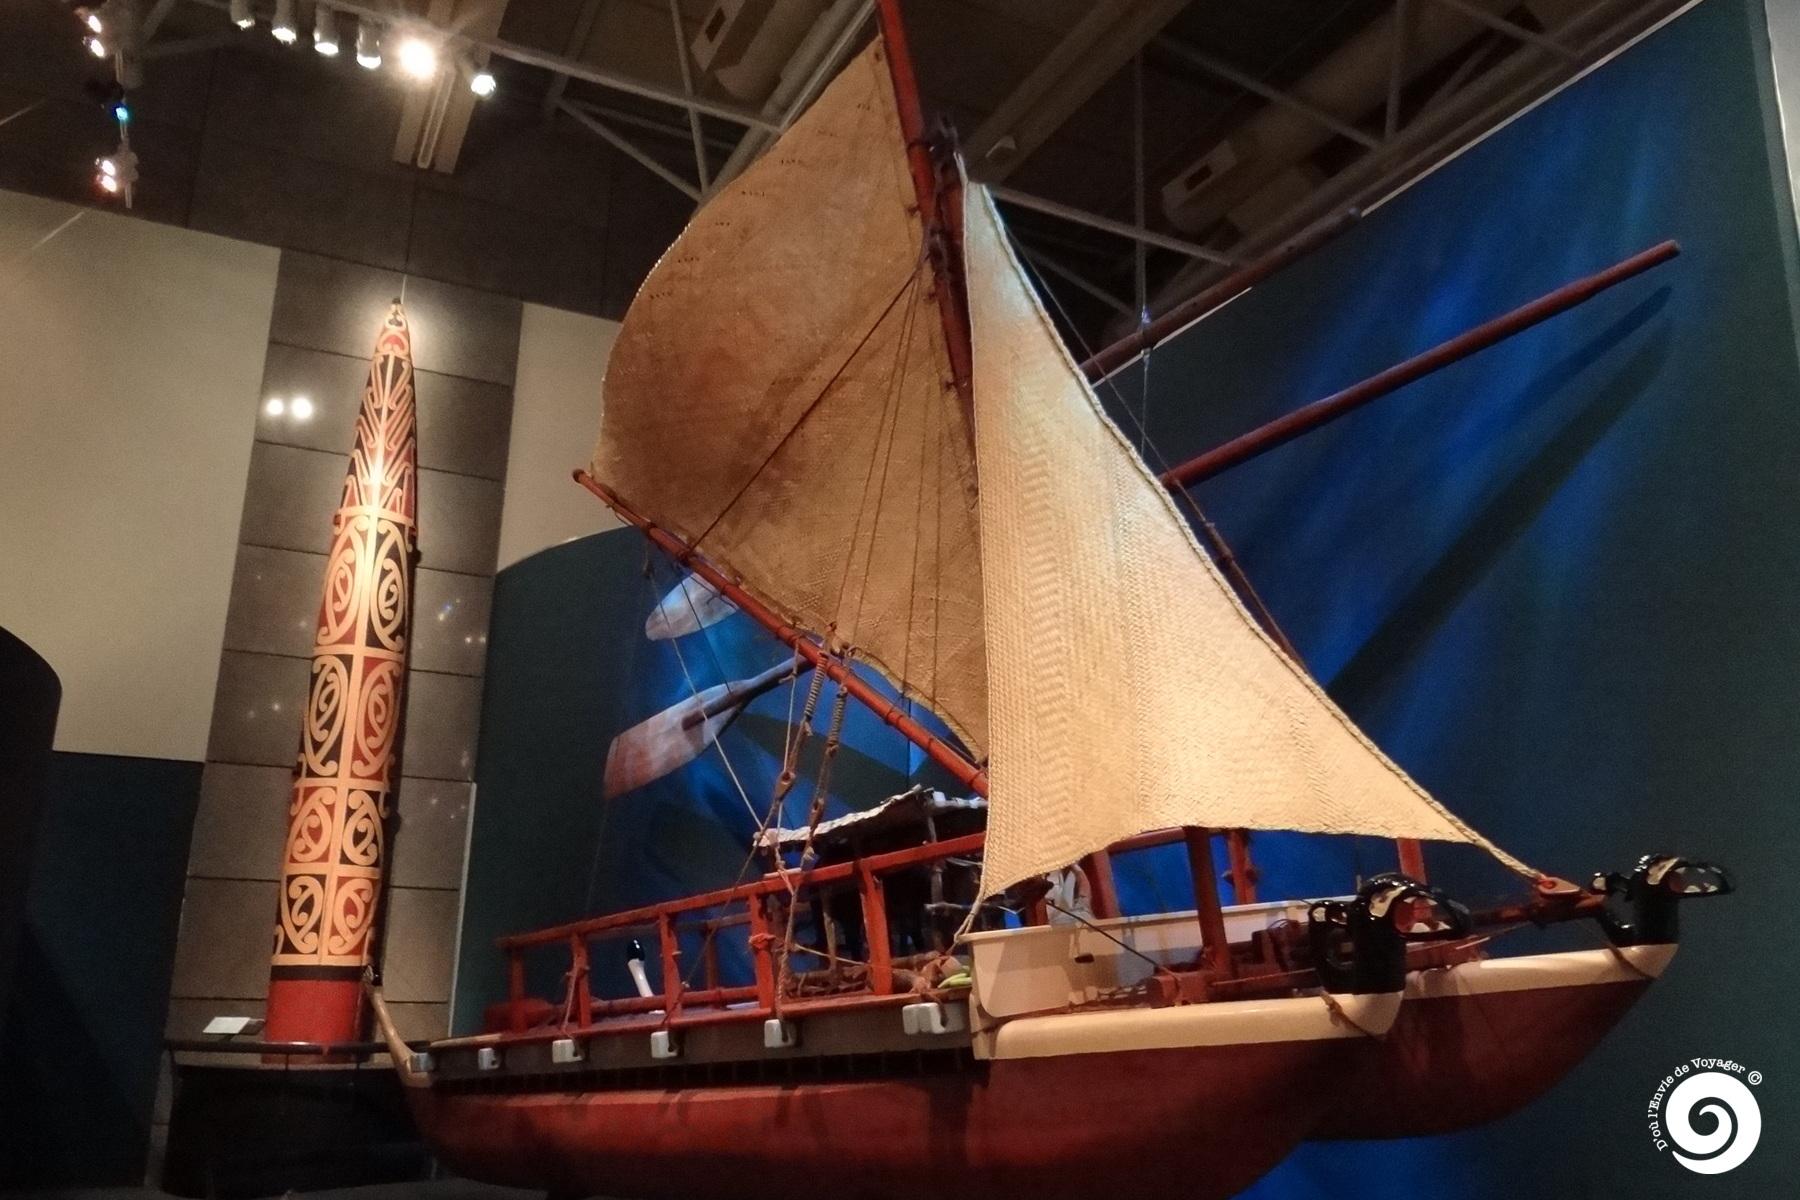 Voyage et culture - Maori